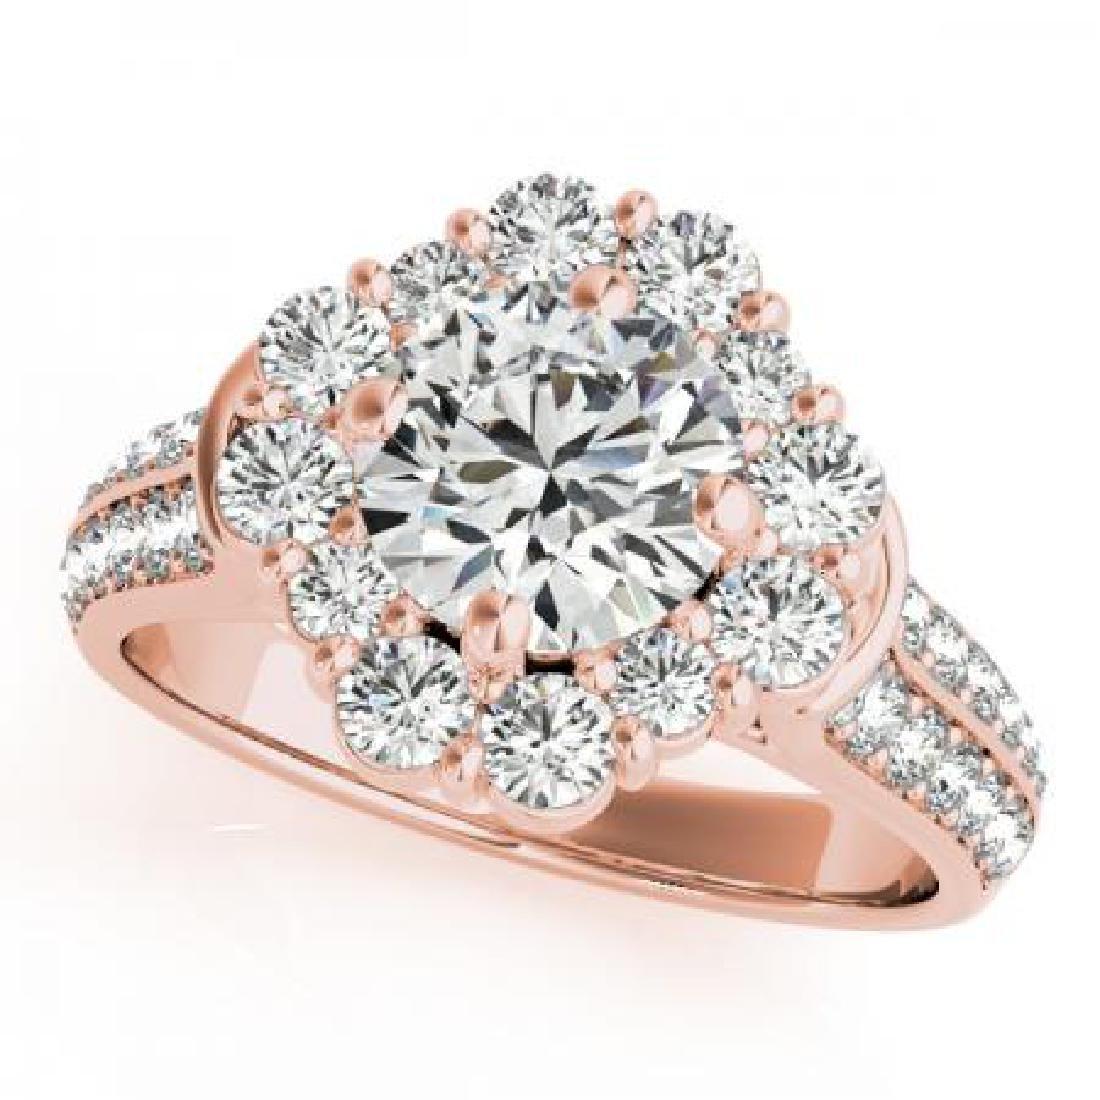 CERTIFIED 18KT ROSE GOLD 1.74 CT G-H/VS-SI1 DIAMOND HAL